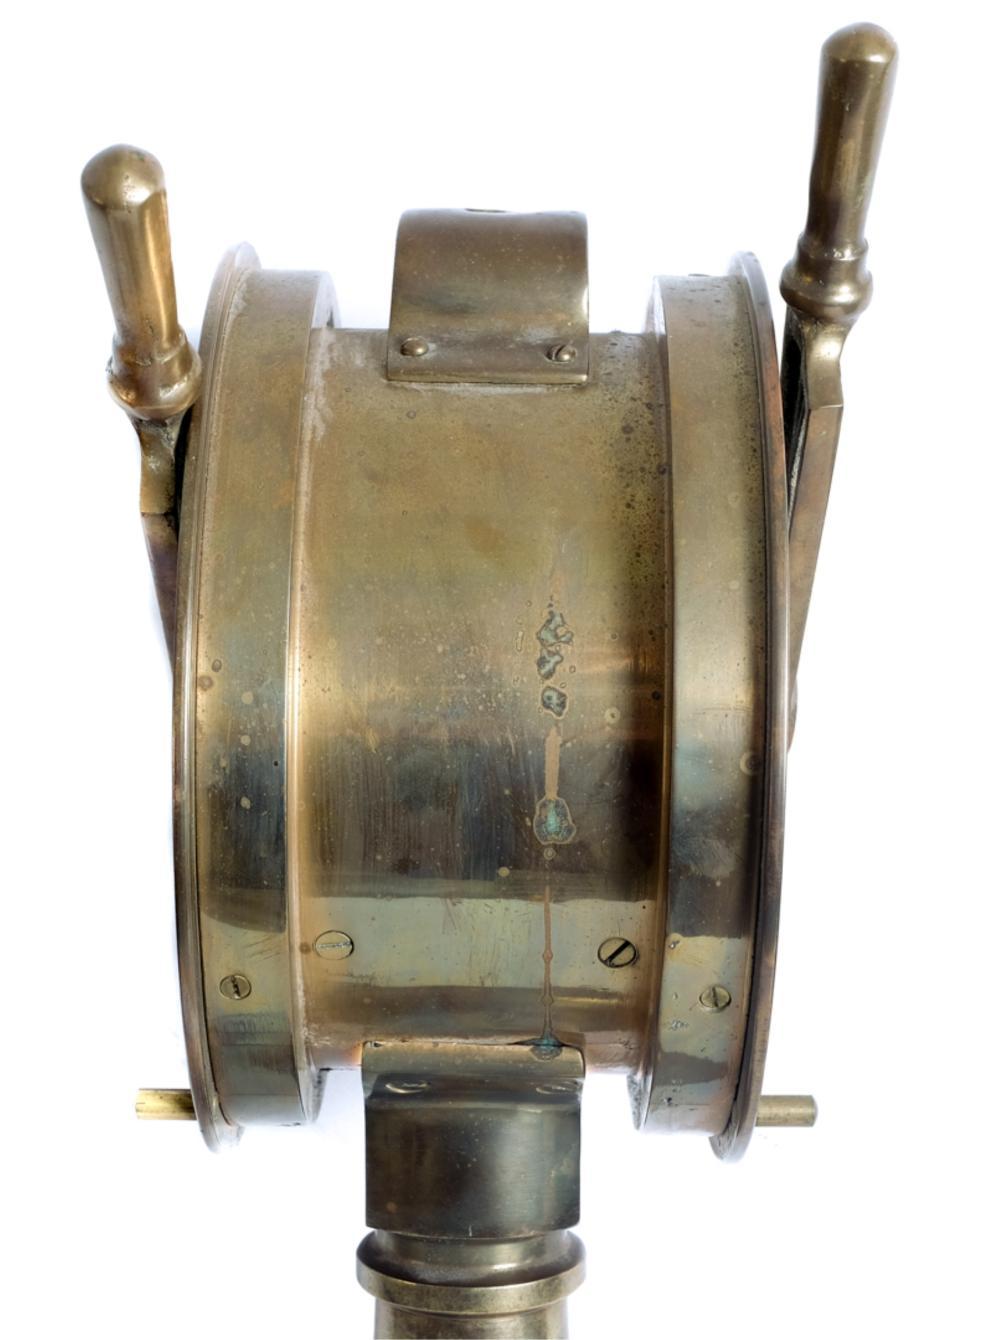 Chadburns Liverpool & London Telegraph Lamp